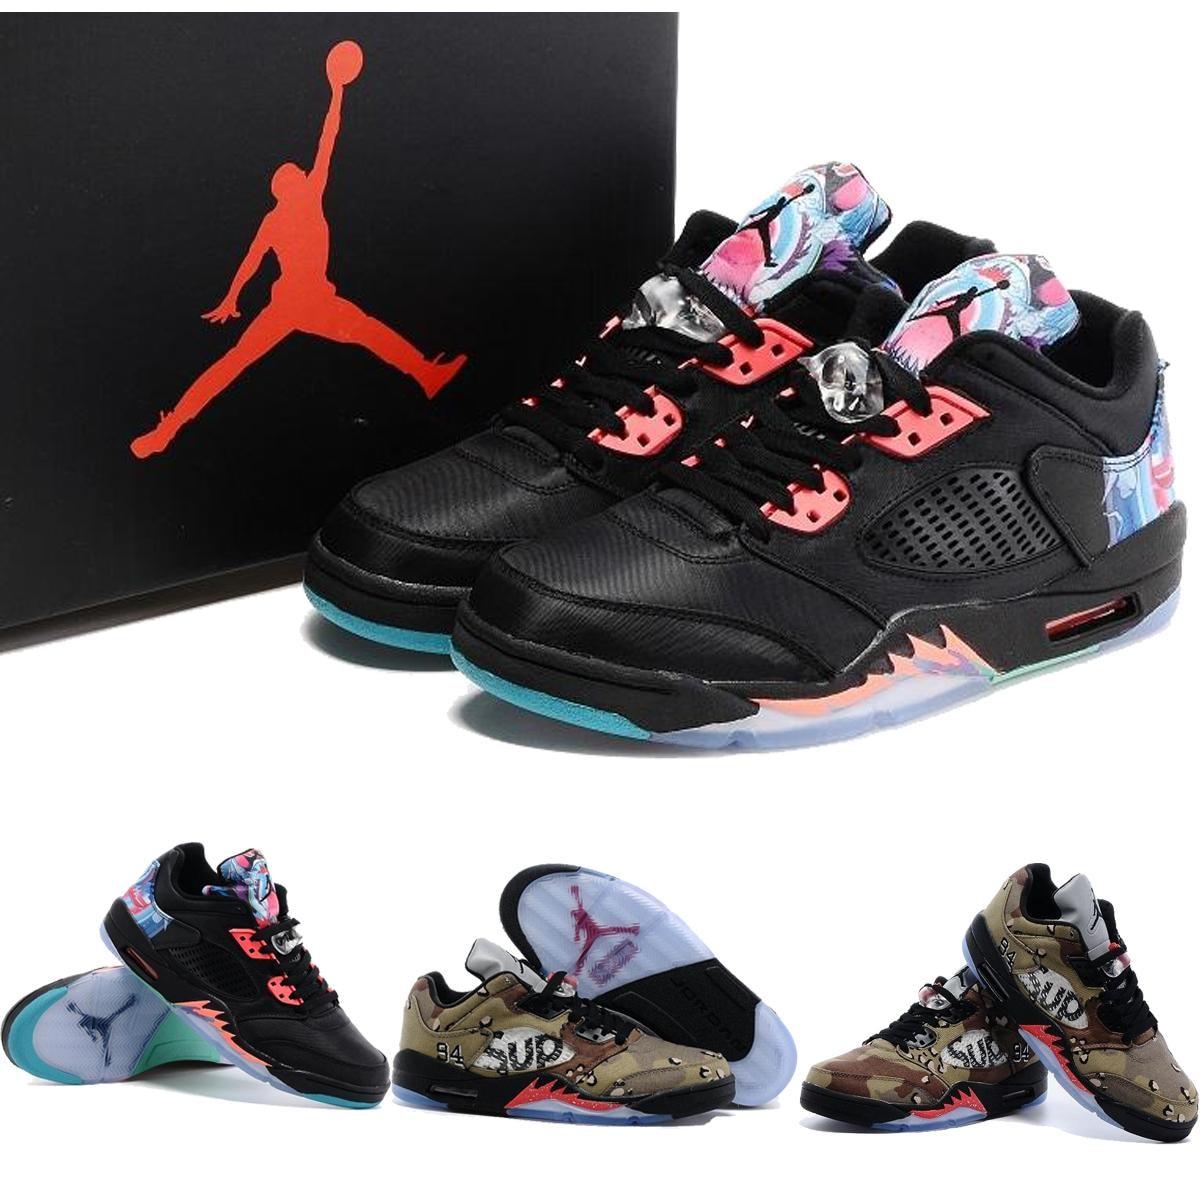 retro air jordans cheap Cheap Jordan Retro 5 Us Size 6